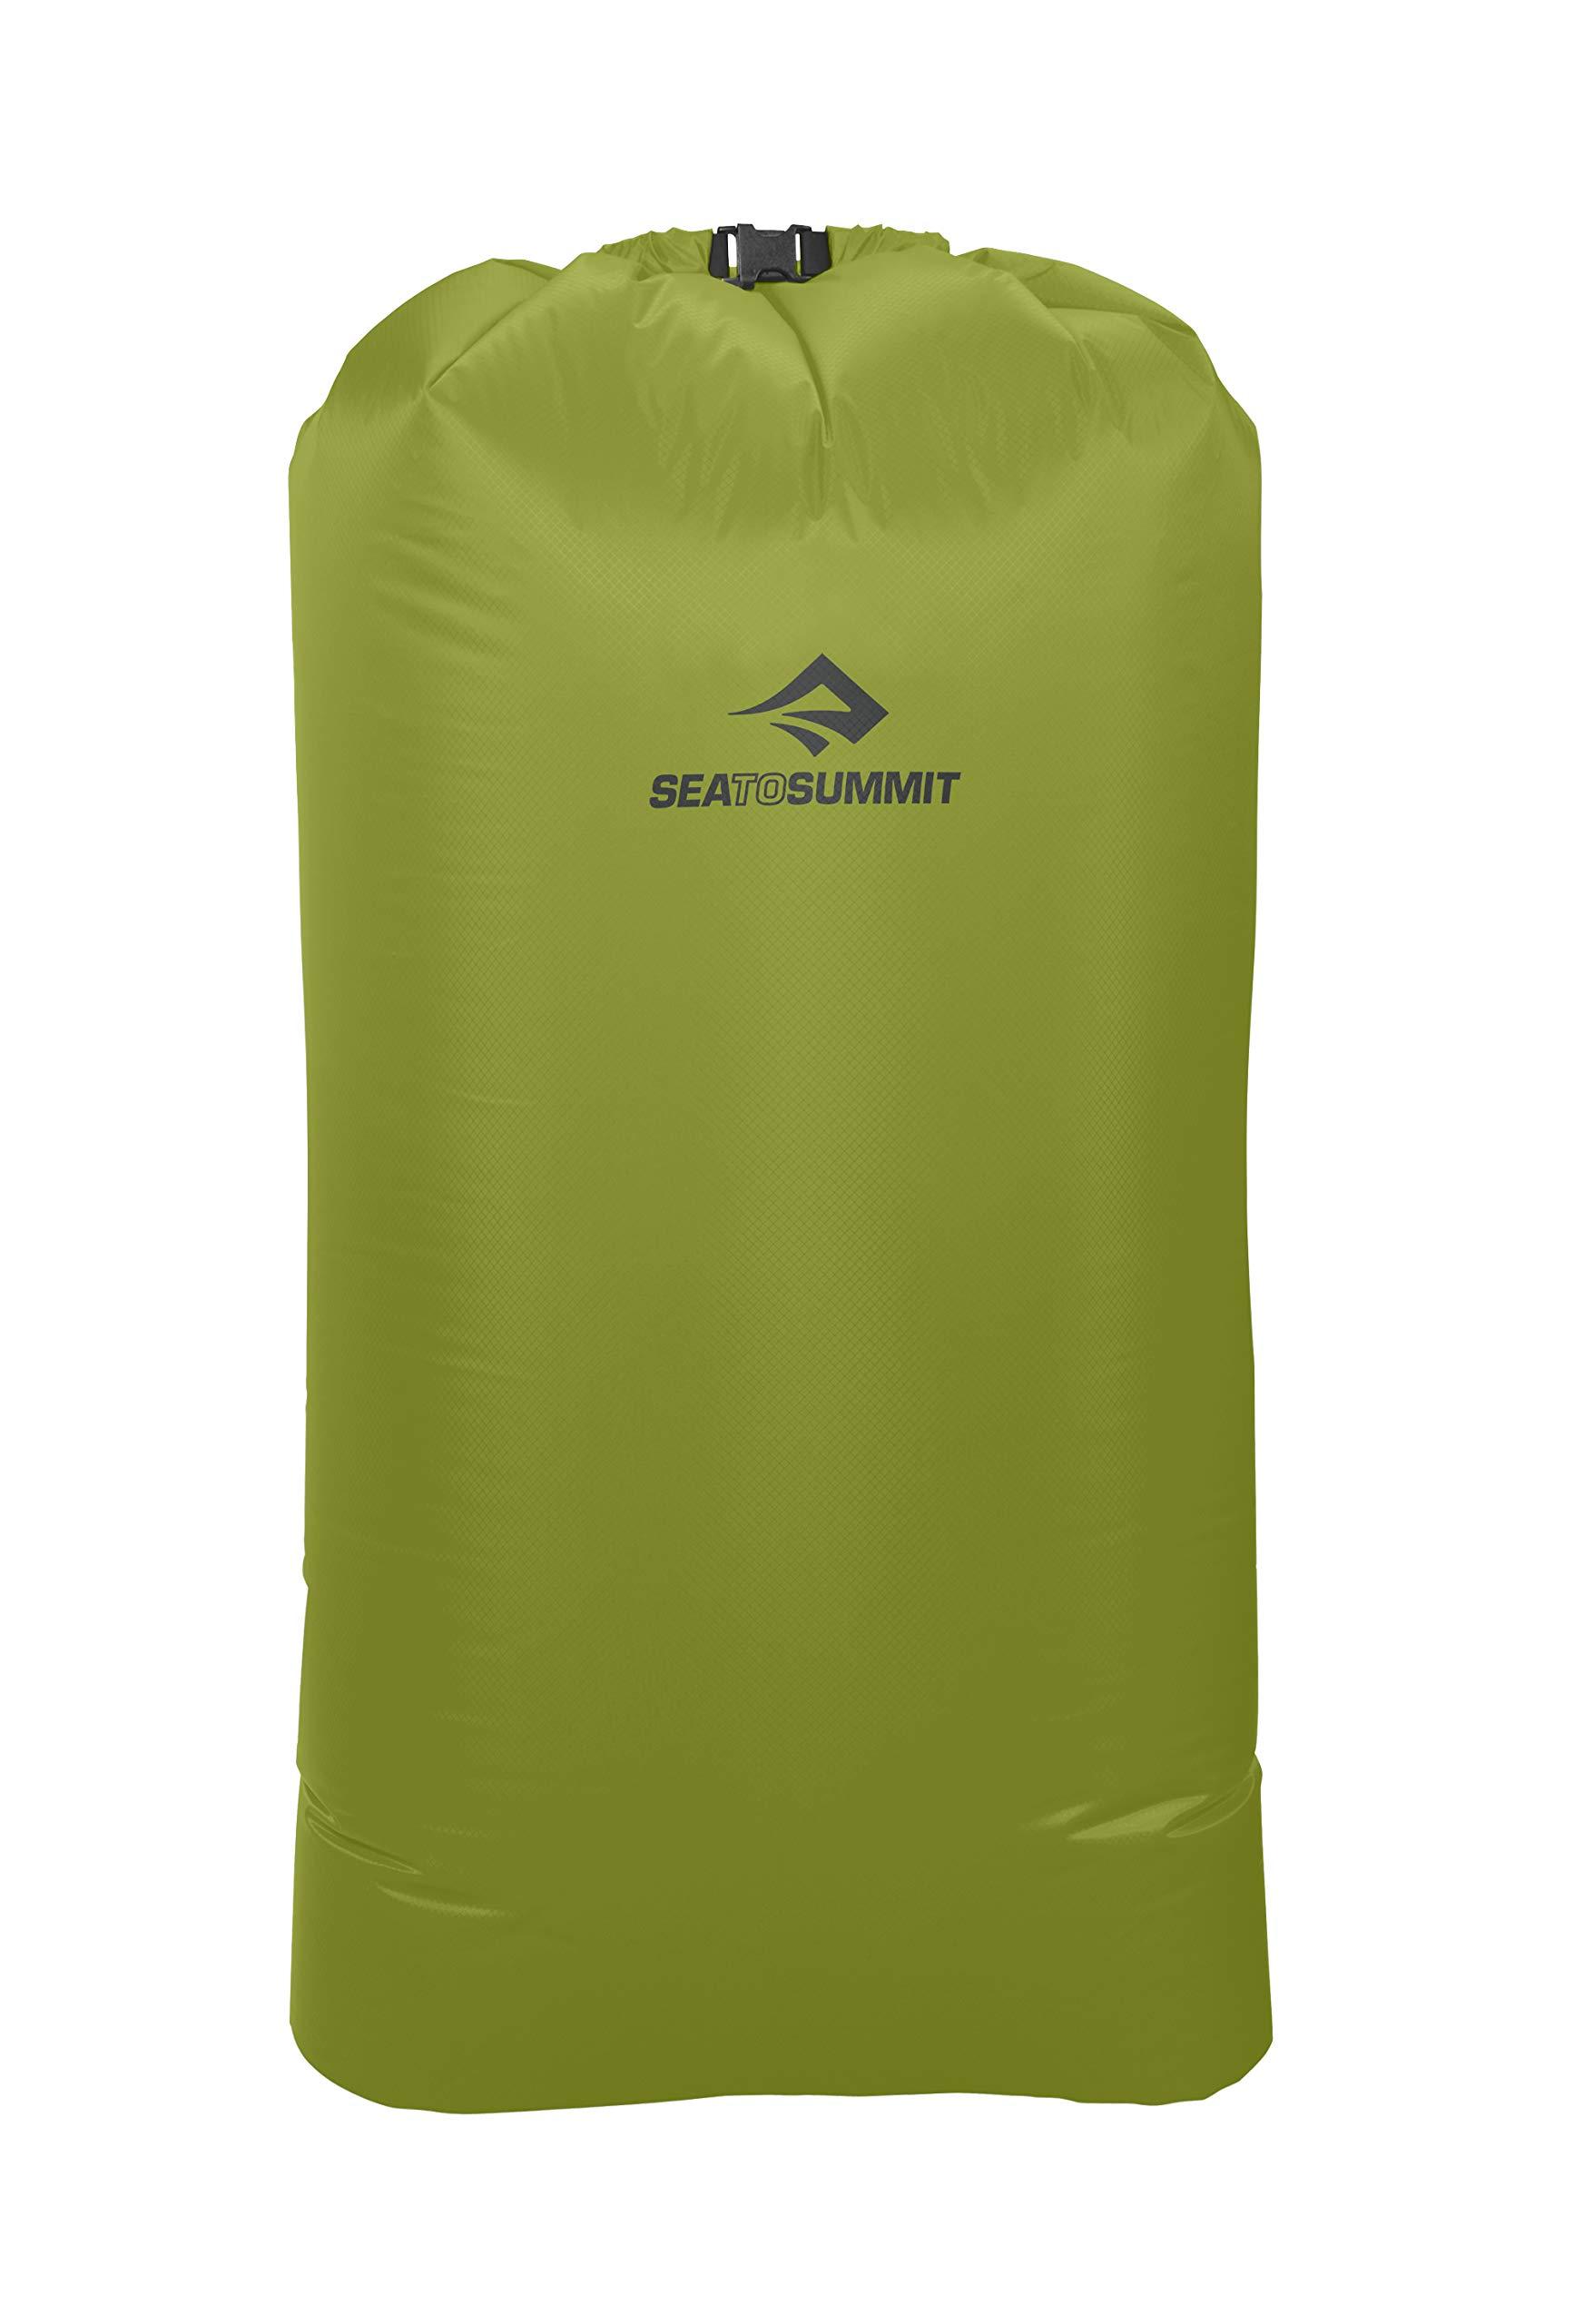 Sea to Summit Ultra-SIL Pack Liner - Medium / 70 Liter (Kiwi Green) by Sea to Summit